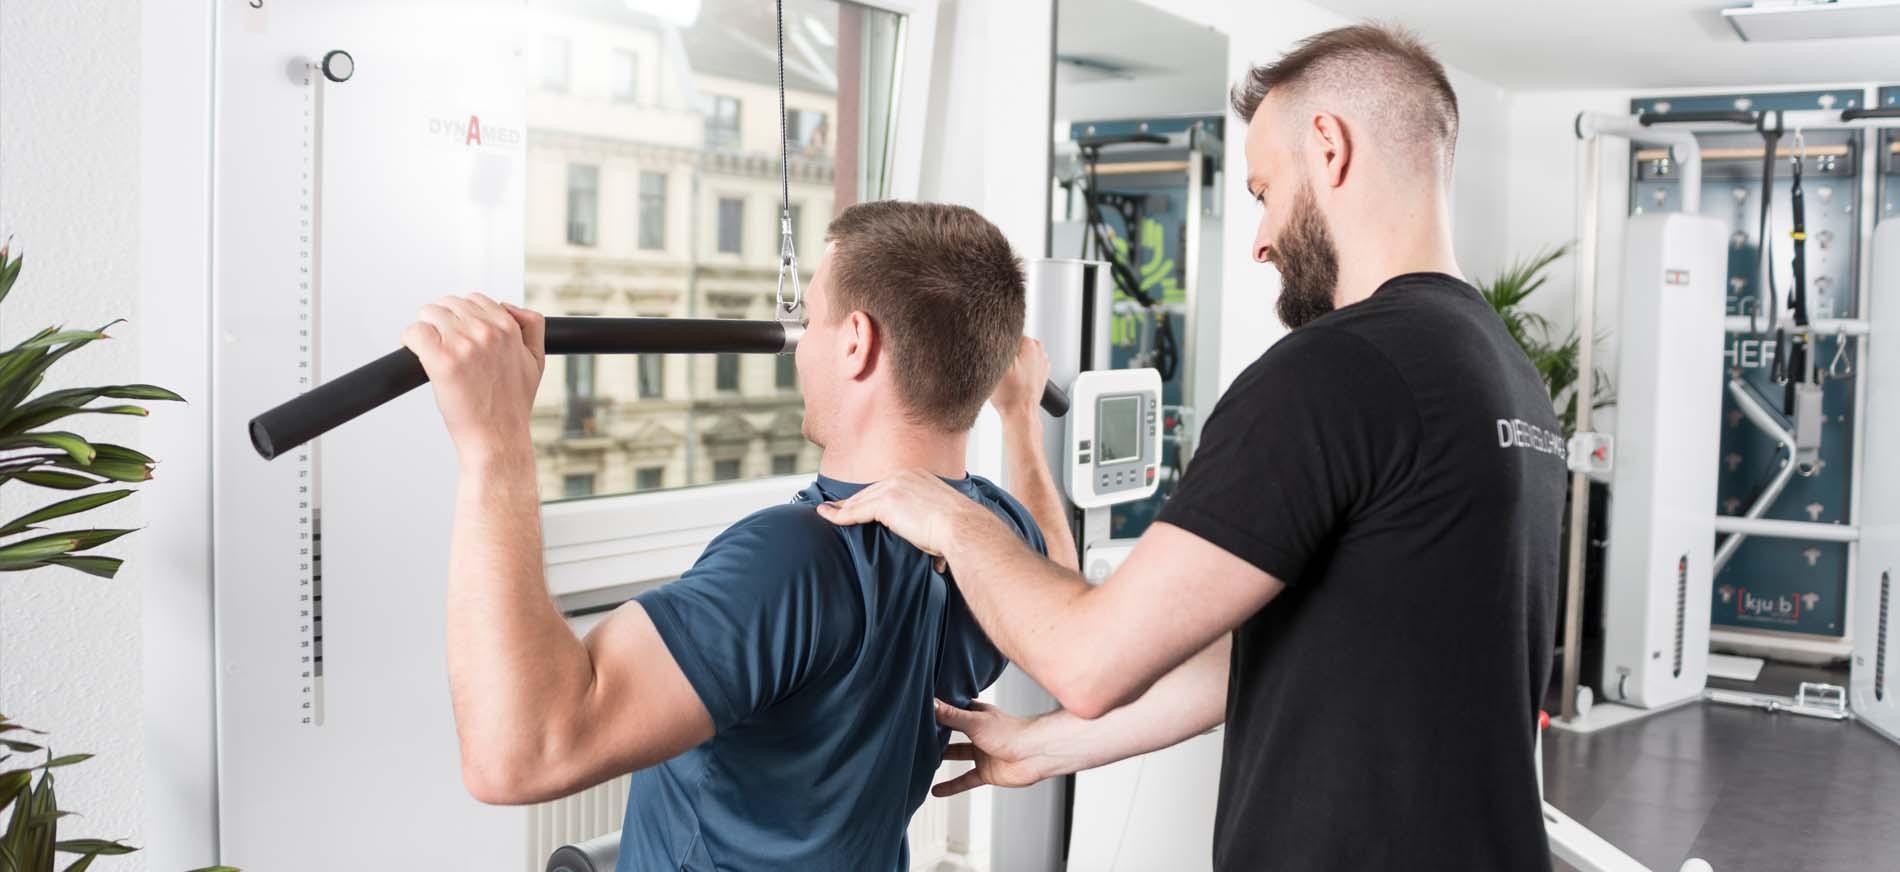 Muskelaufbau mit Physiotherapie in Köln